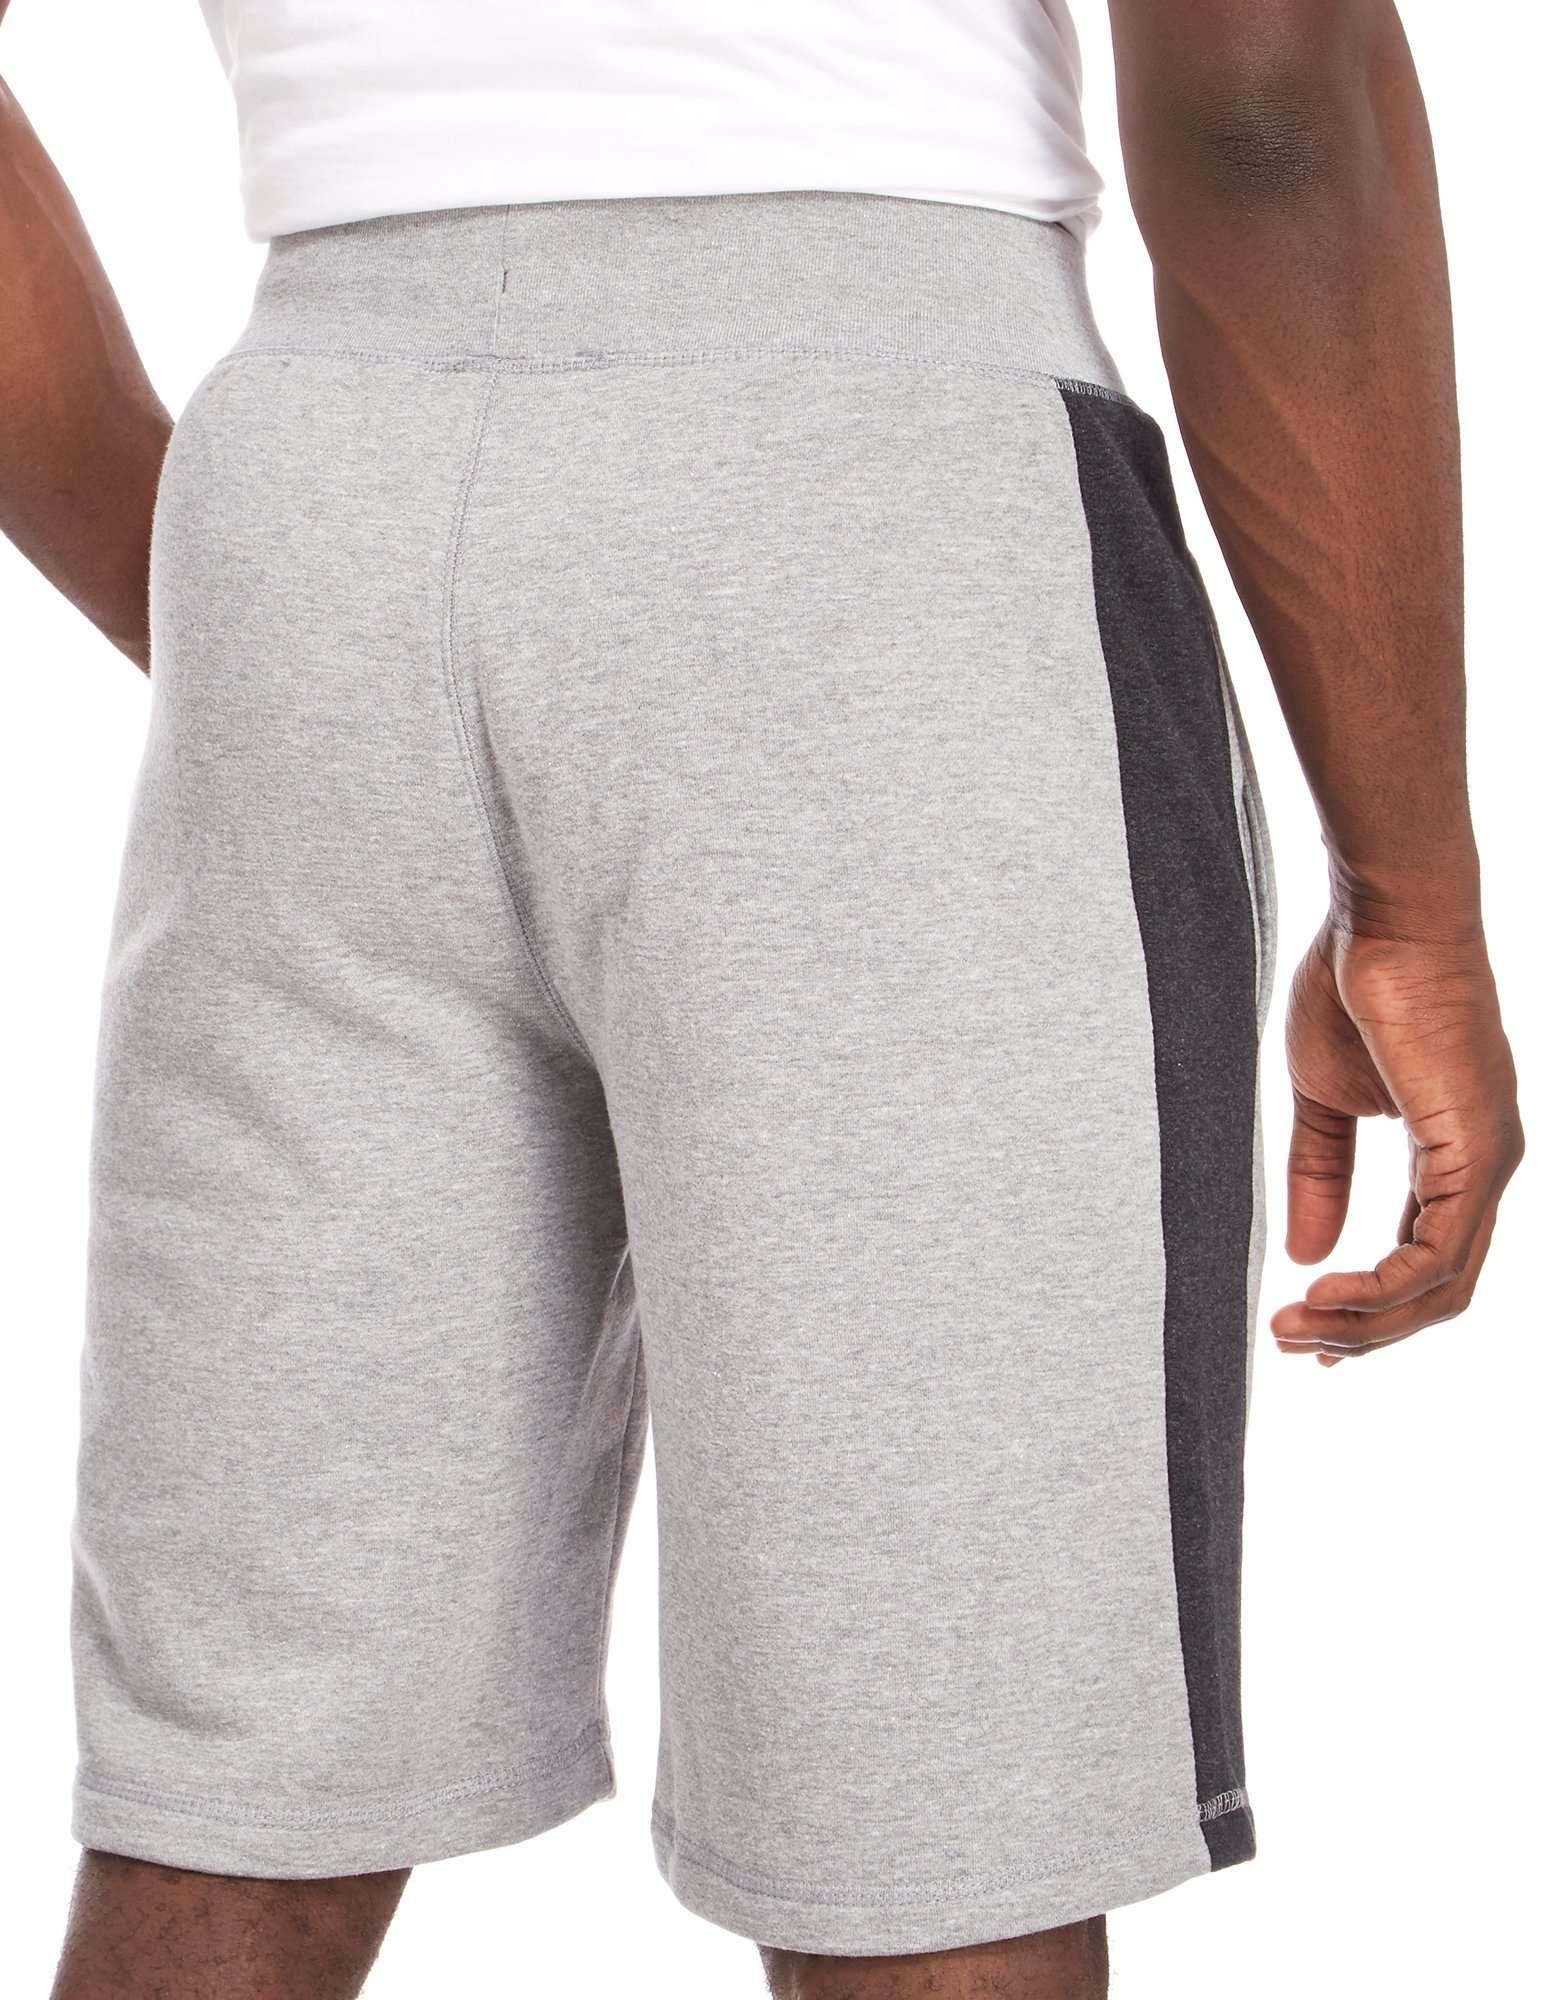 McKenzie Reynolds Fleece Shorts